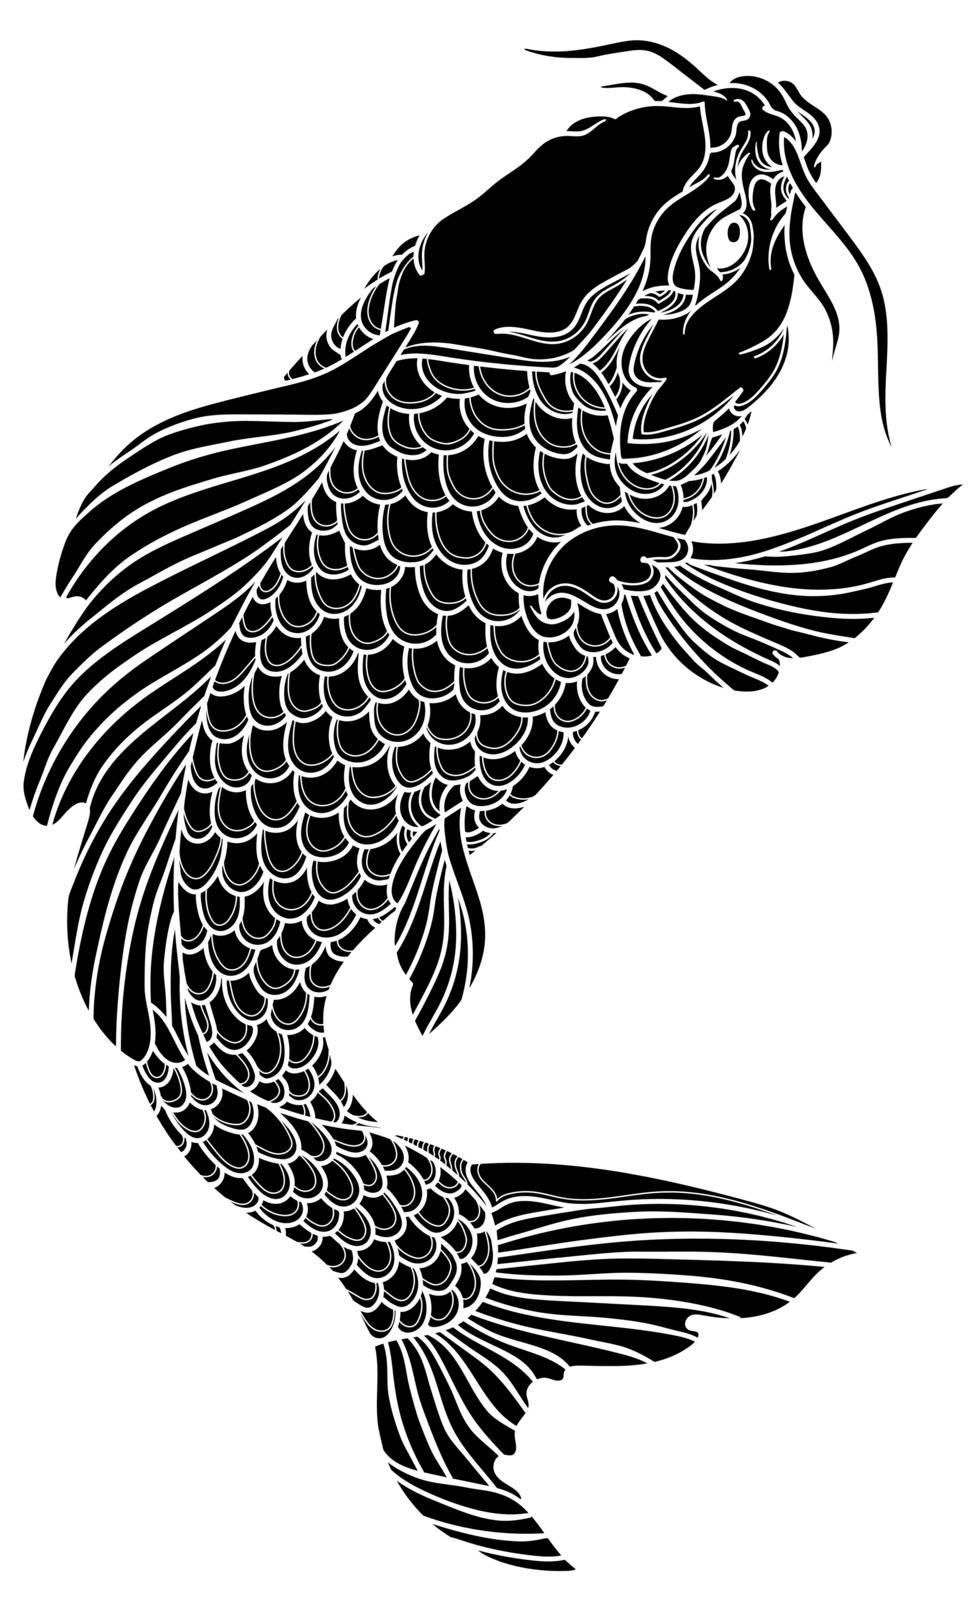 black koi carp fish swimming up. Tattoo. Isolated vector illustration